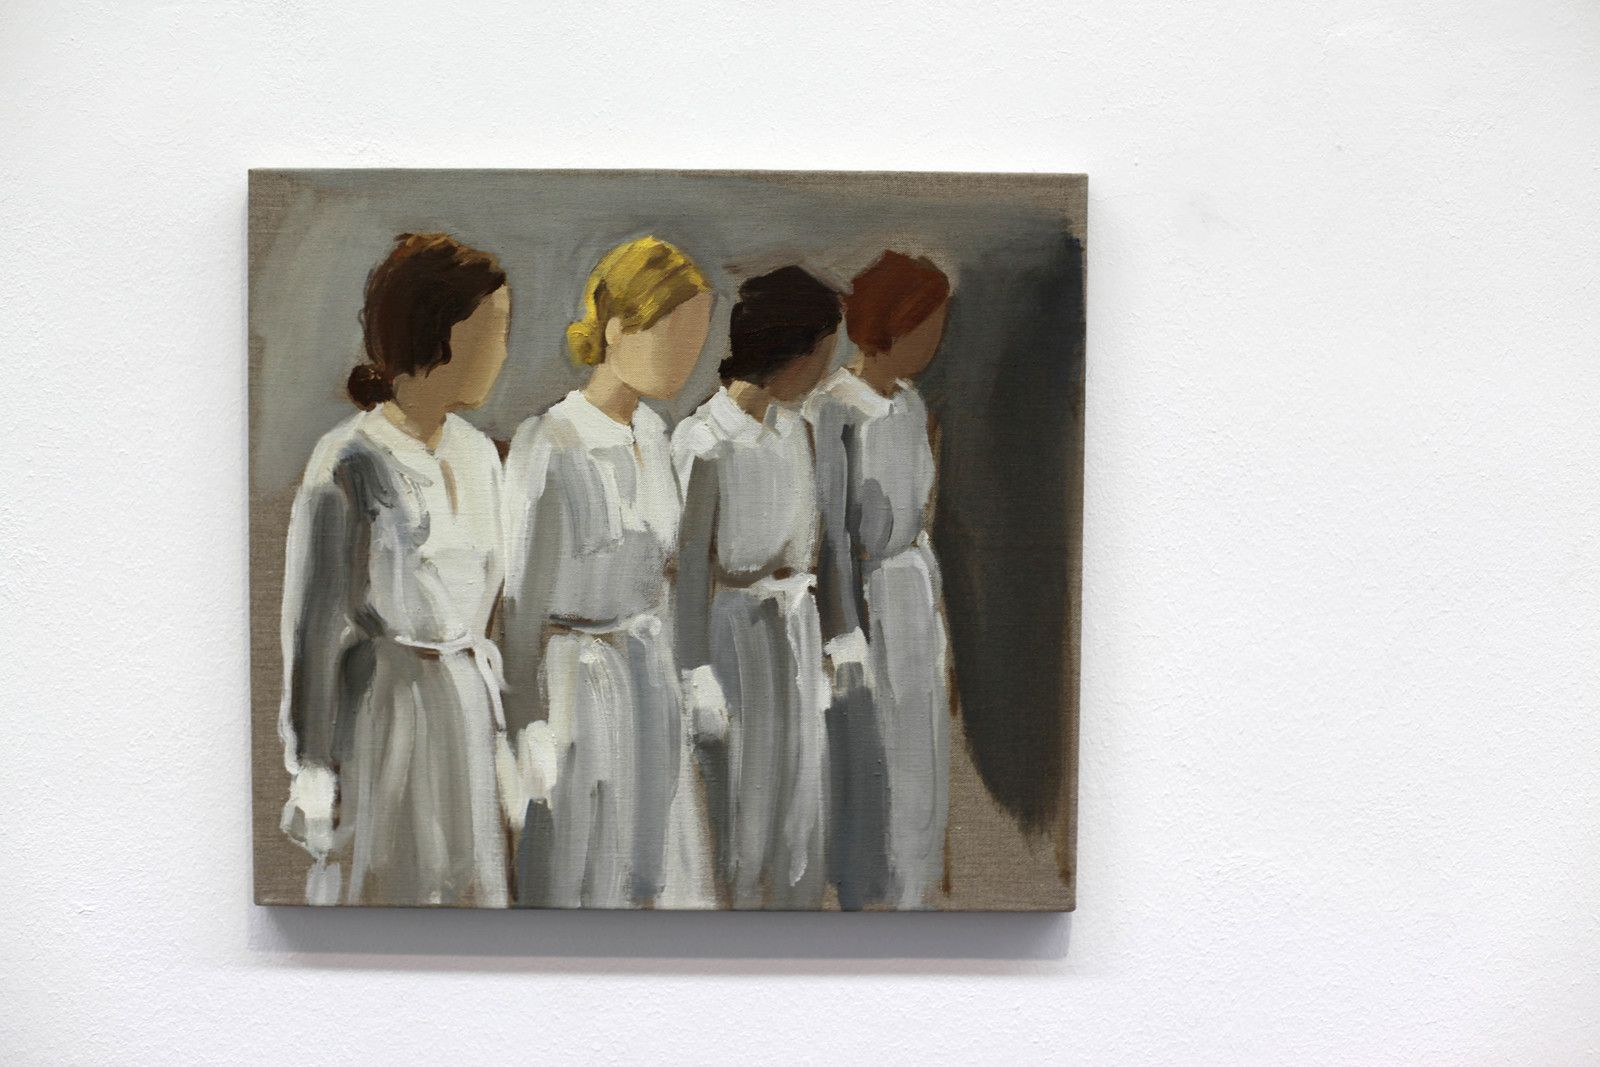 """Six Girls in Uniform"", 2019 de Gideon RUBIN - Courtesy de l'artiste et de la Galerie Karsyen GREVE © Photo Éric Simon"